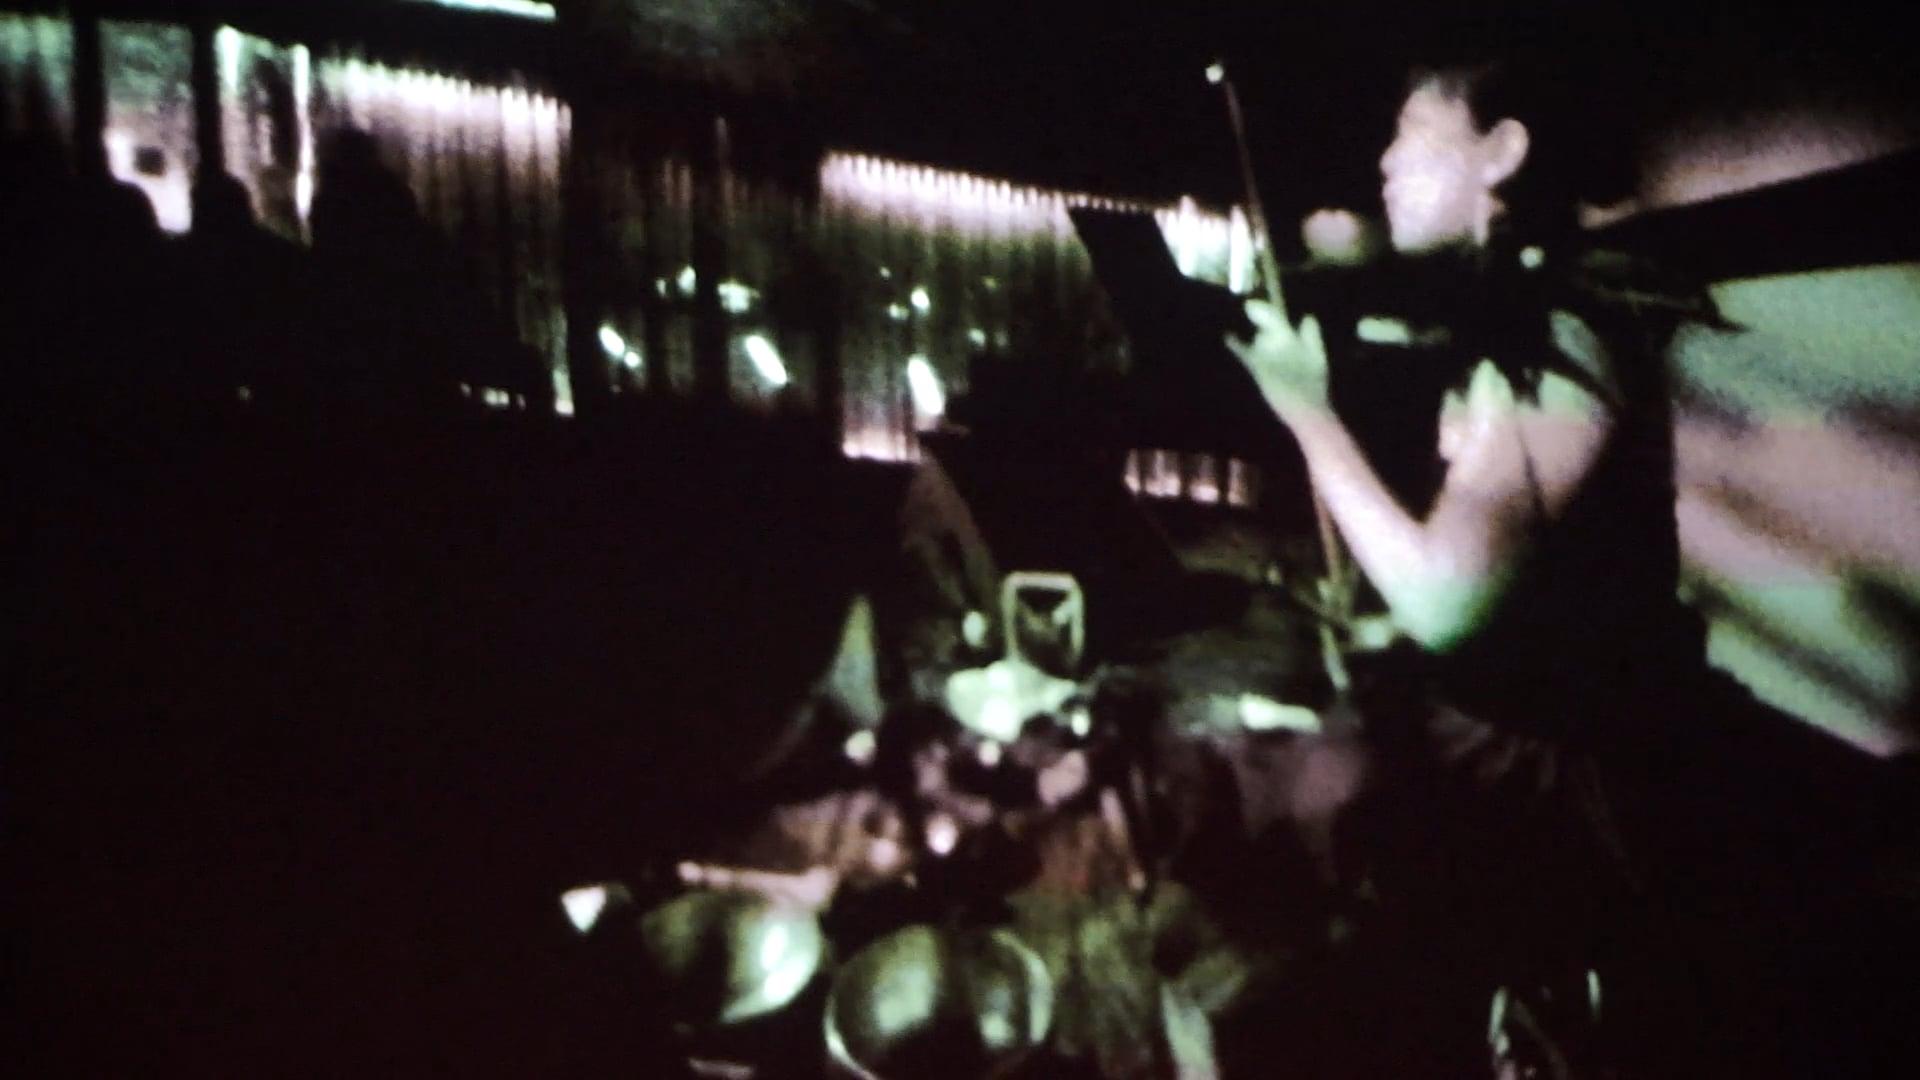 ( (( PHONATION )) ) R. Luke DuBois and Bora Yoon (trailer video)